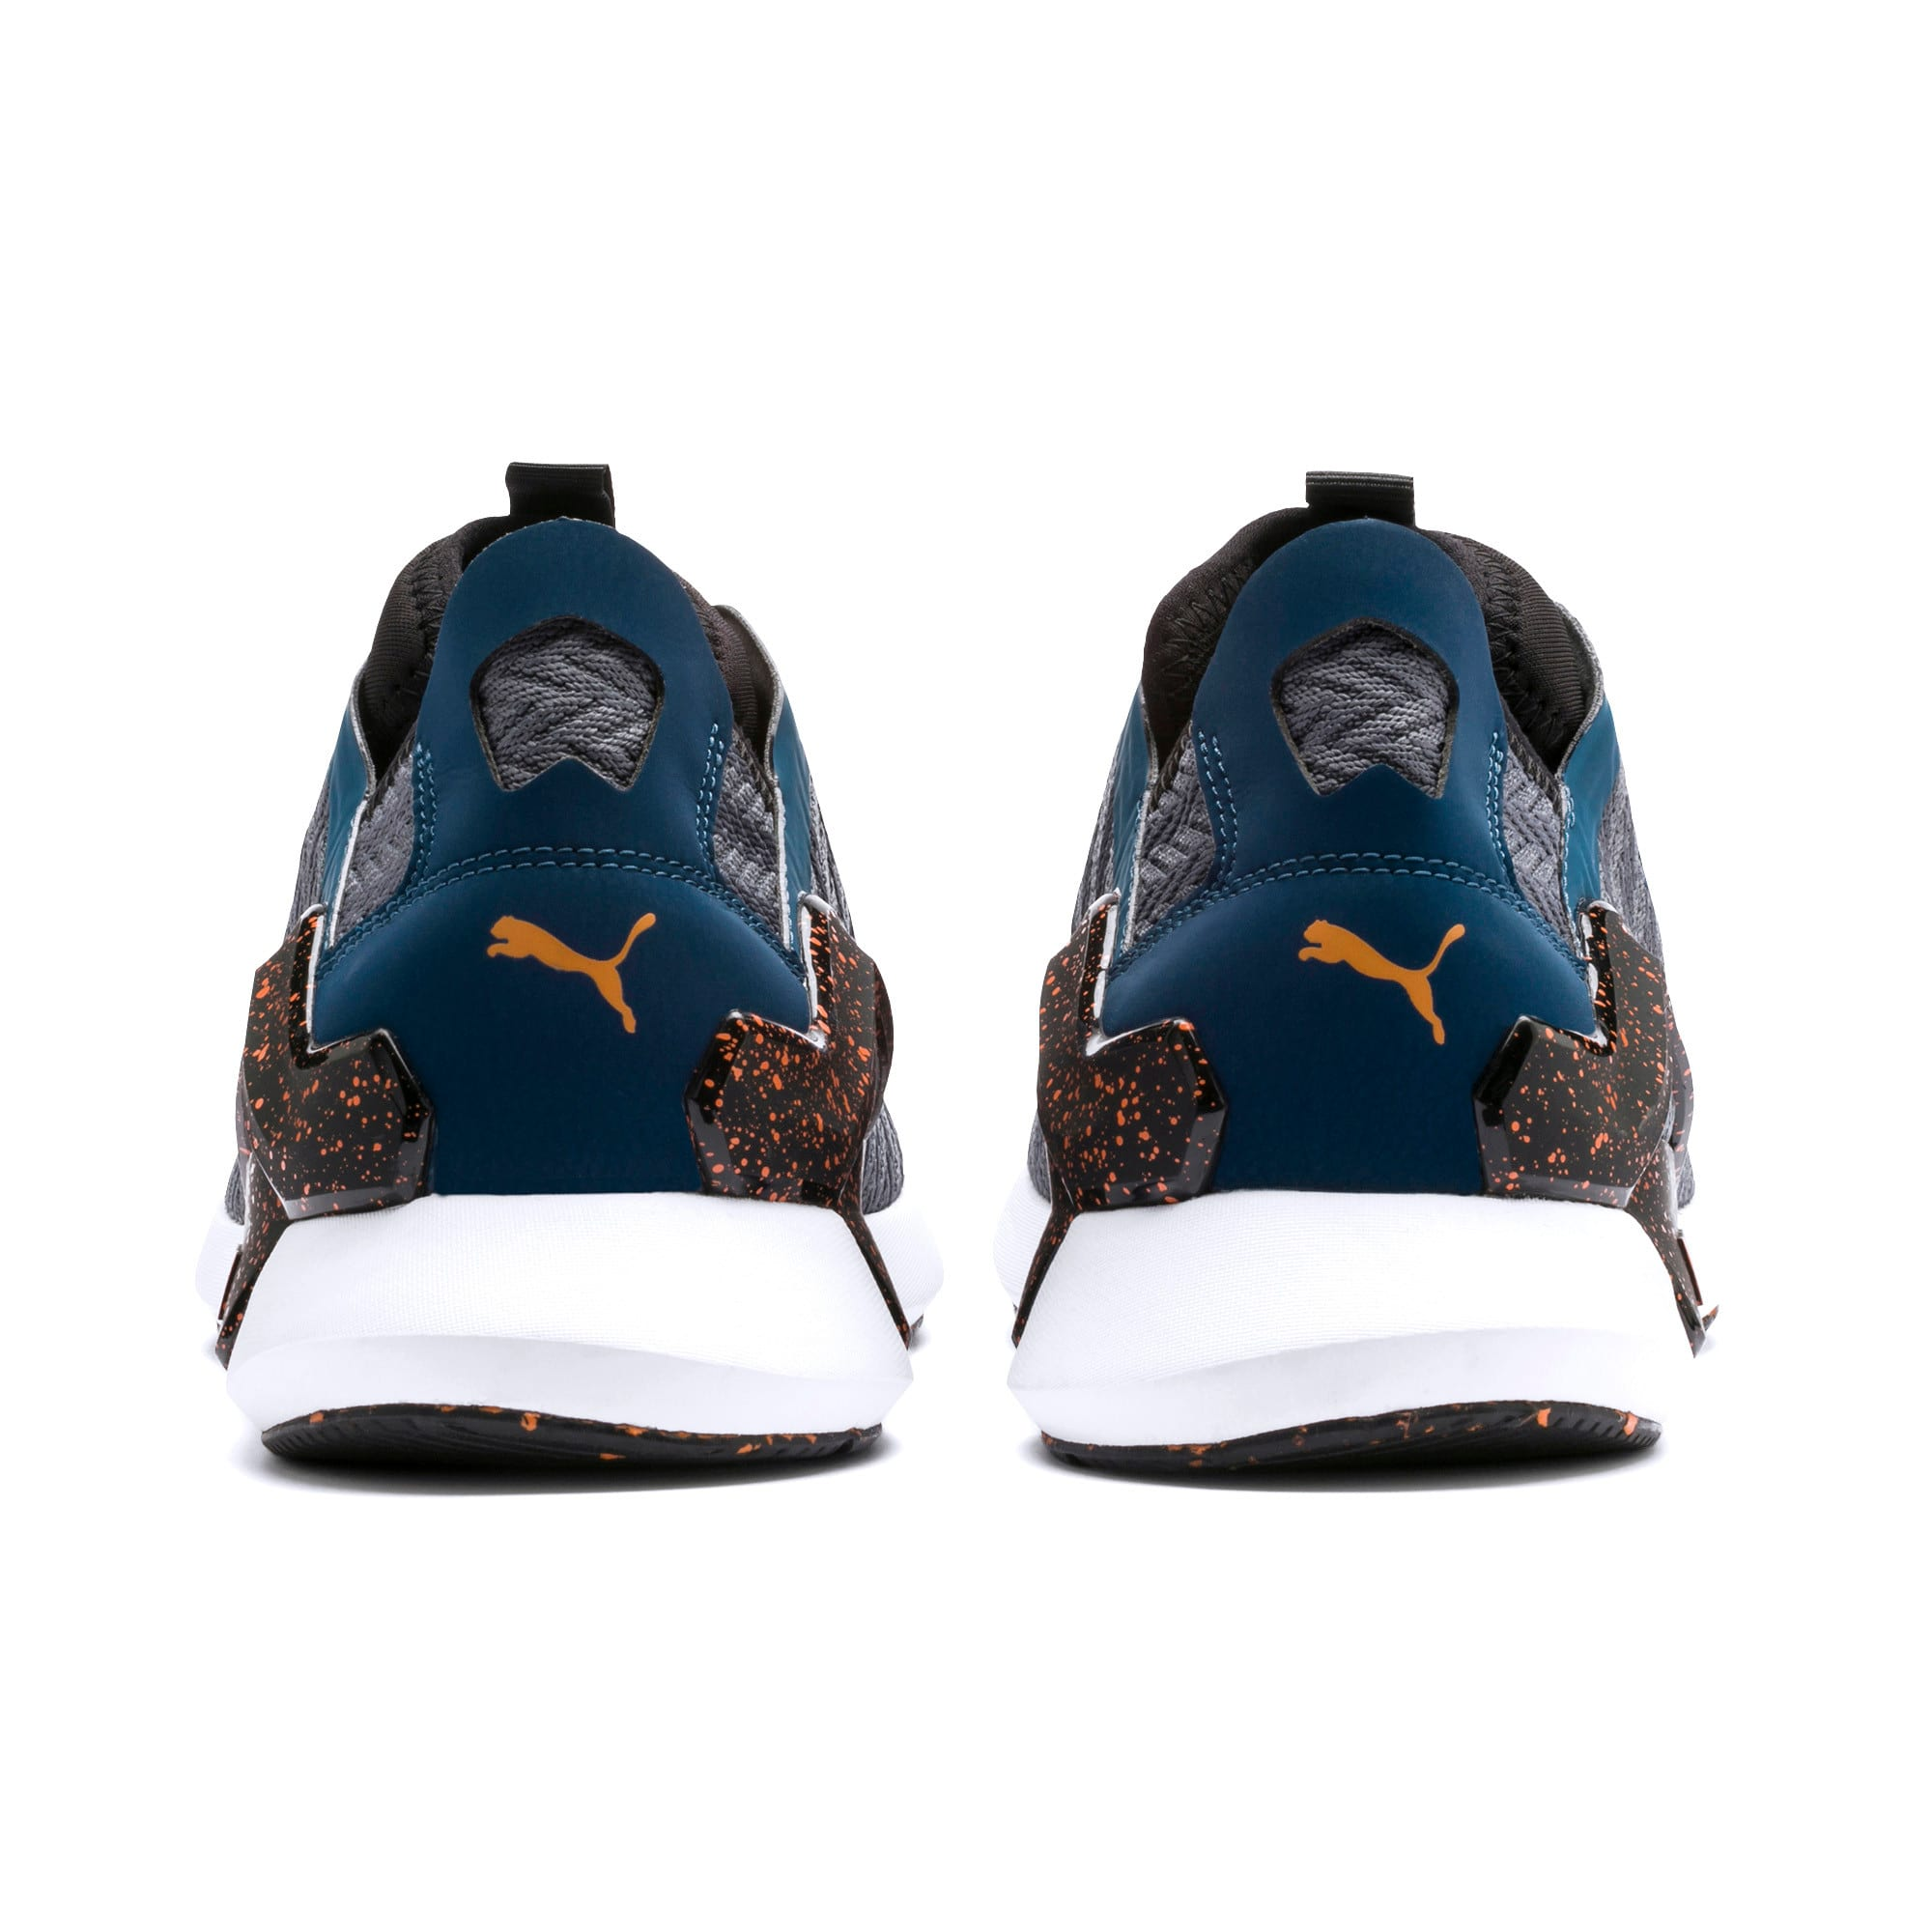 Thumbnail 4 of Rogue X Terrain Men's Training Shoes, CASTLEROCK-Gibr Sea-J Orange, medium